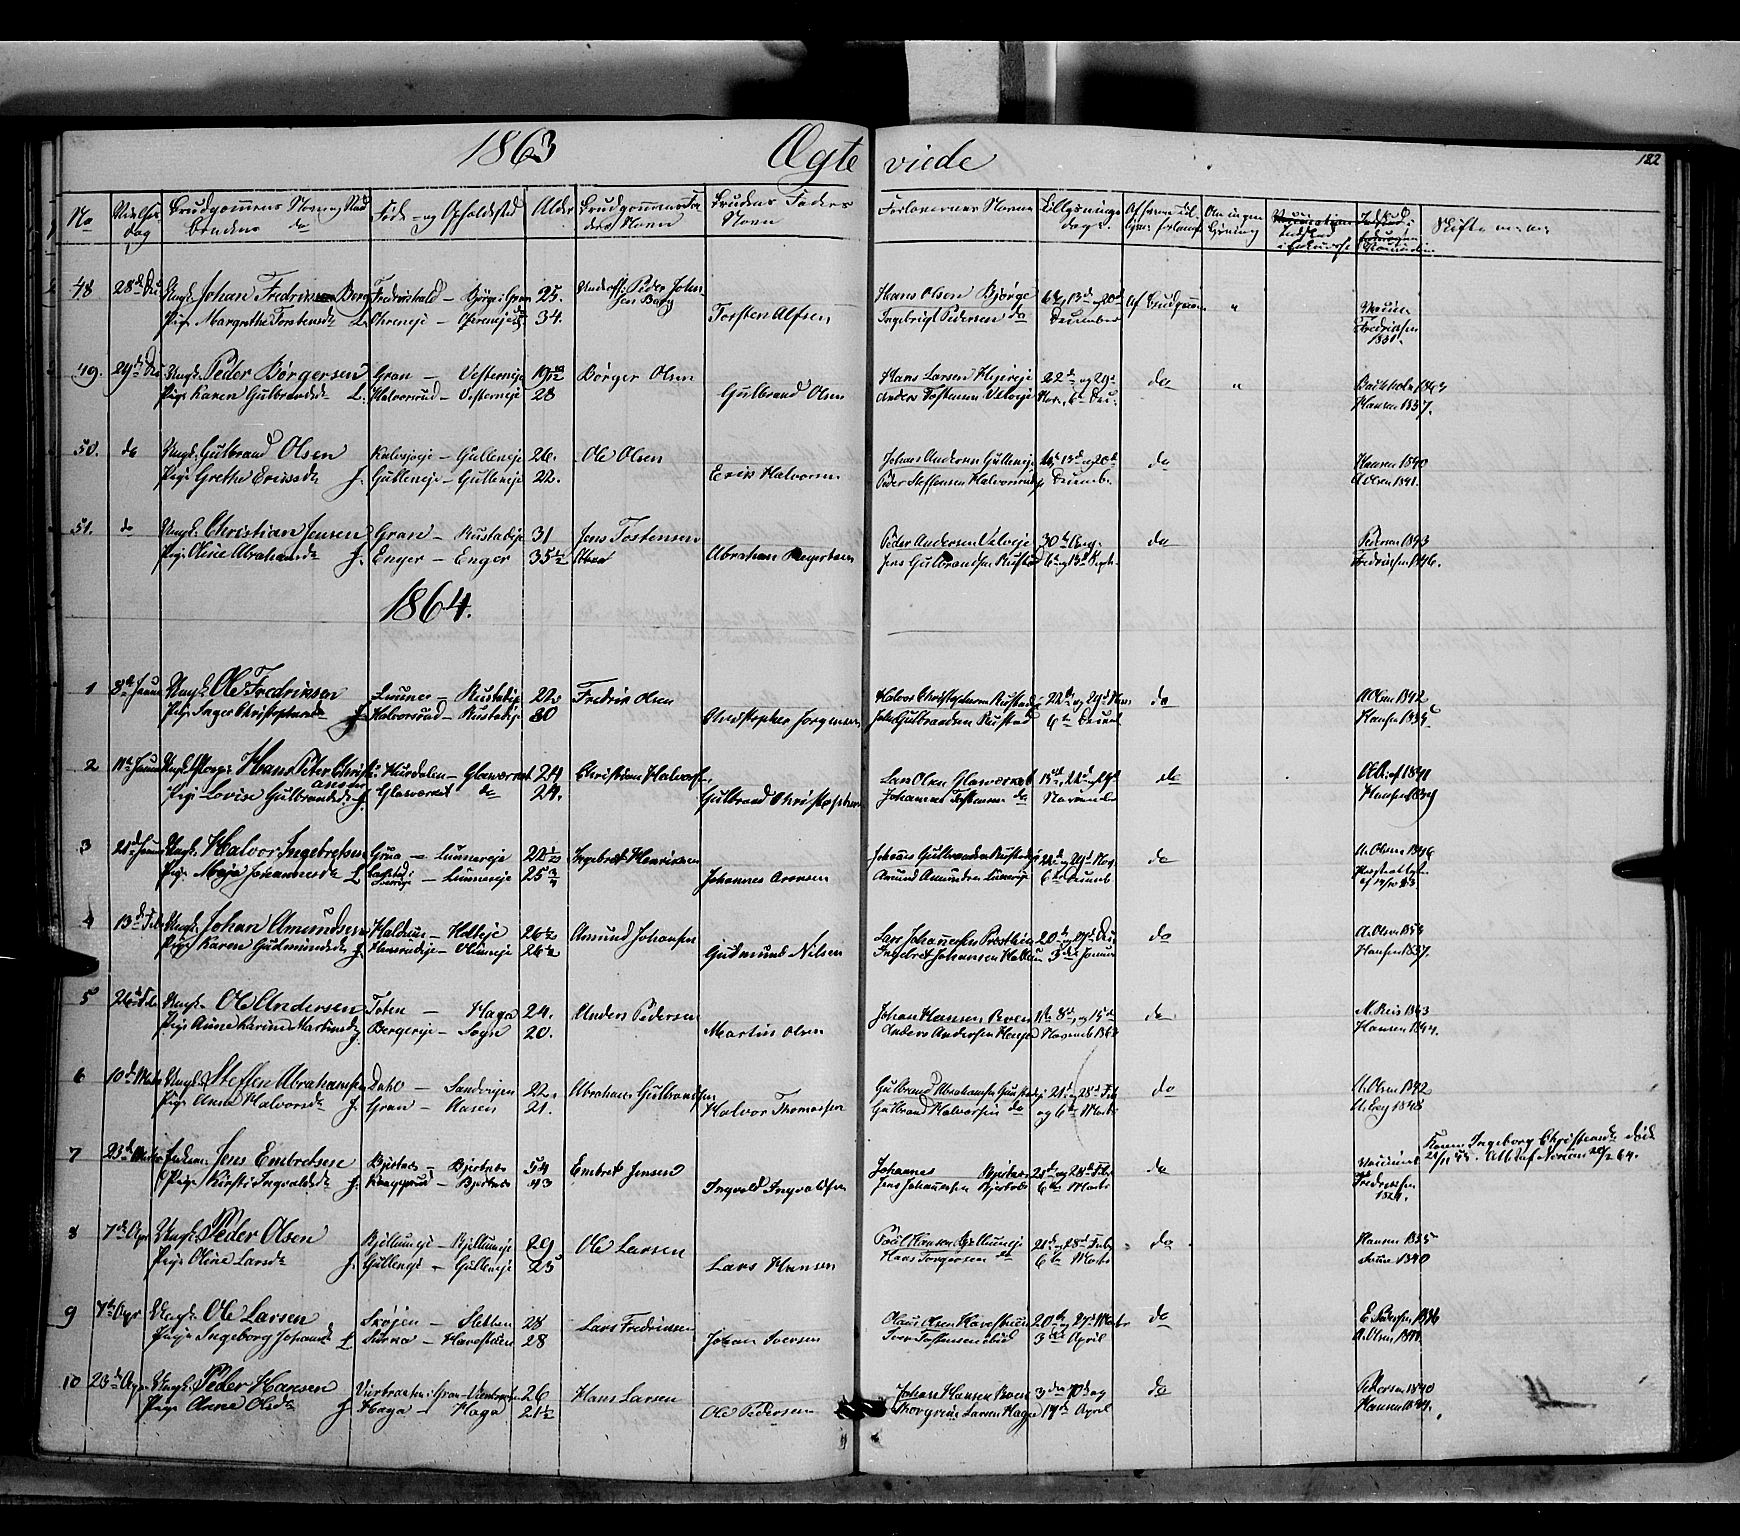 SAH, Jevnaker prestekontor, Ministerialbok nr. 7, 1858-1876, s. 182